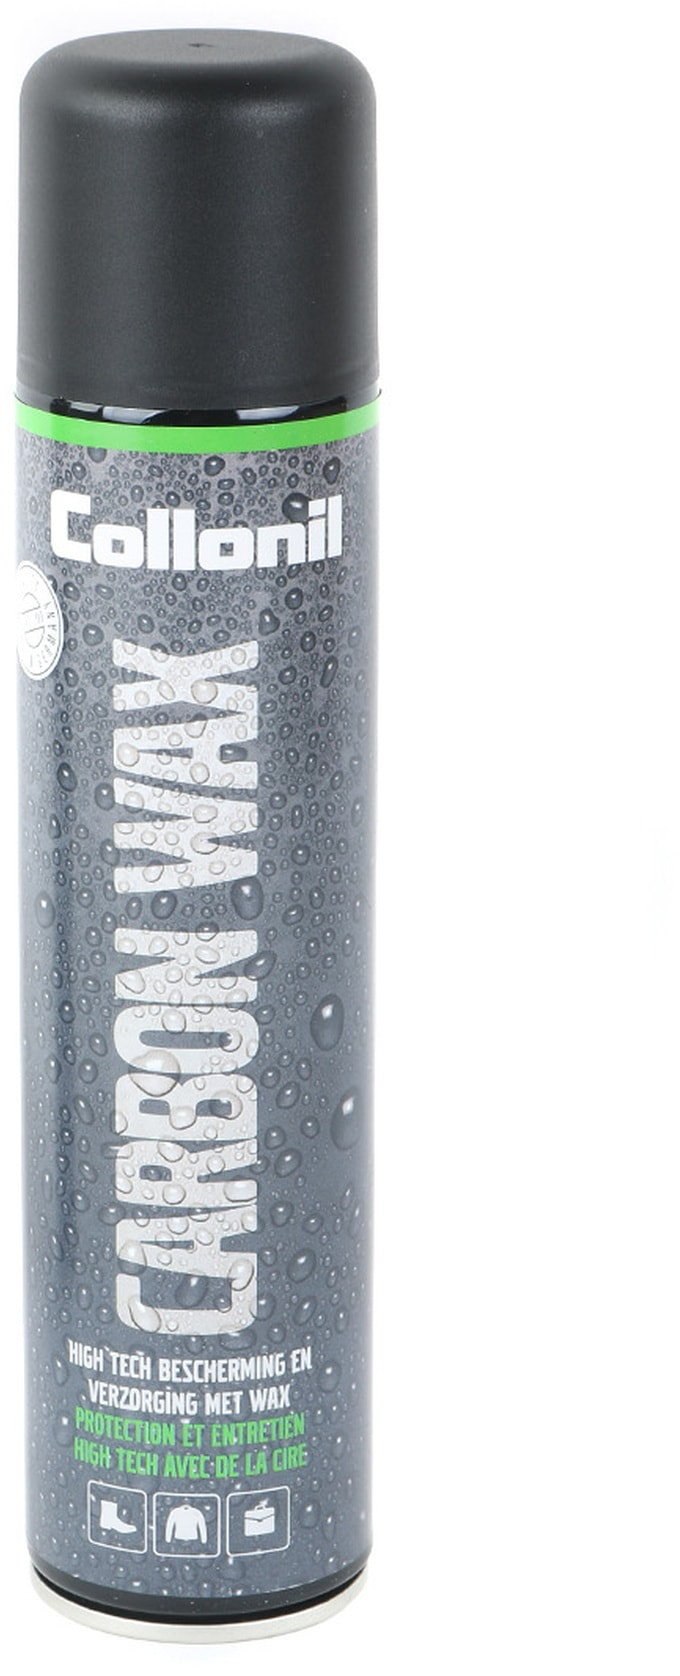 Collonil Carbon Wax Impregneerspray